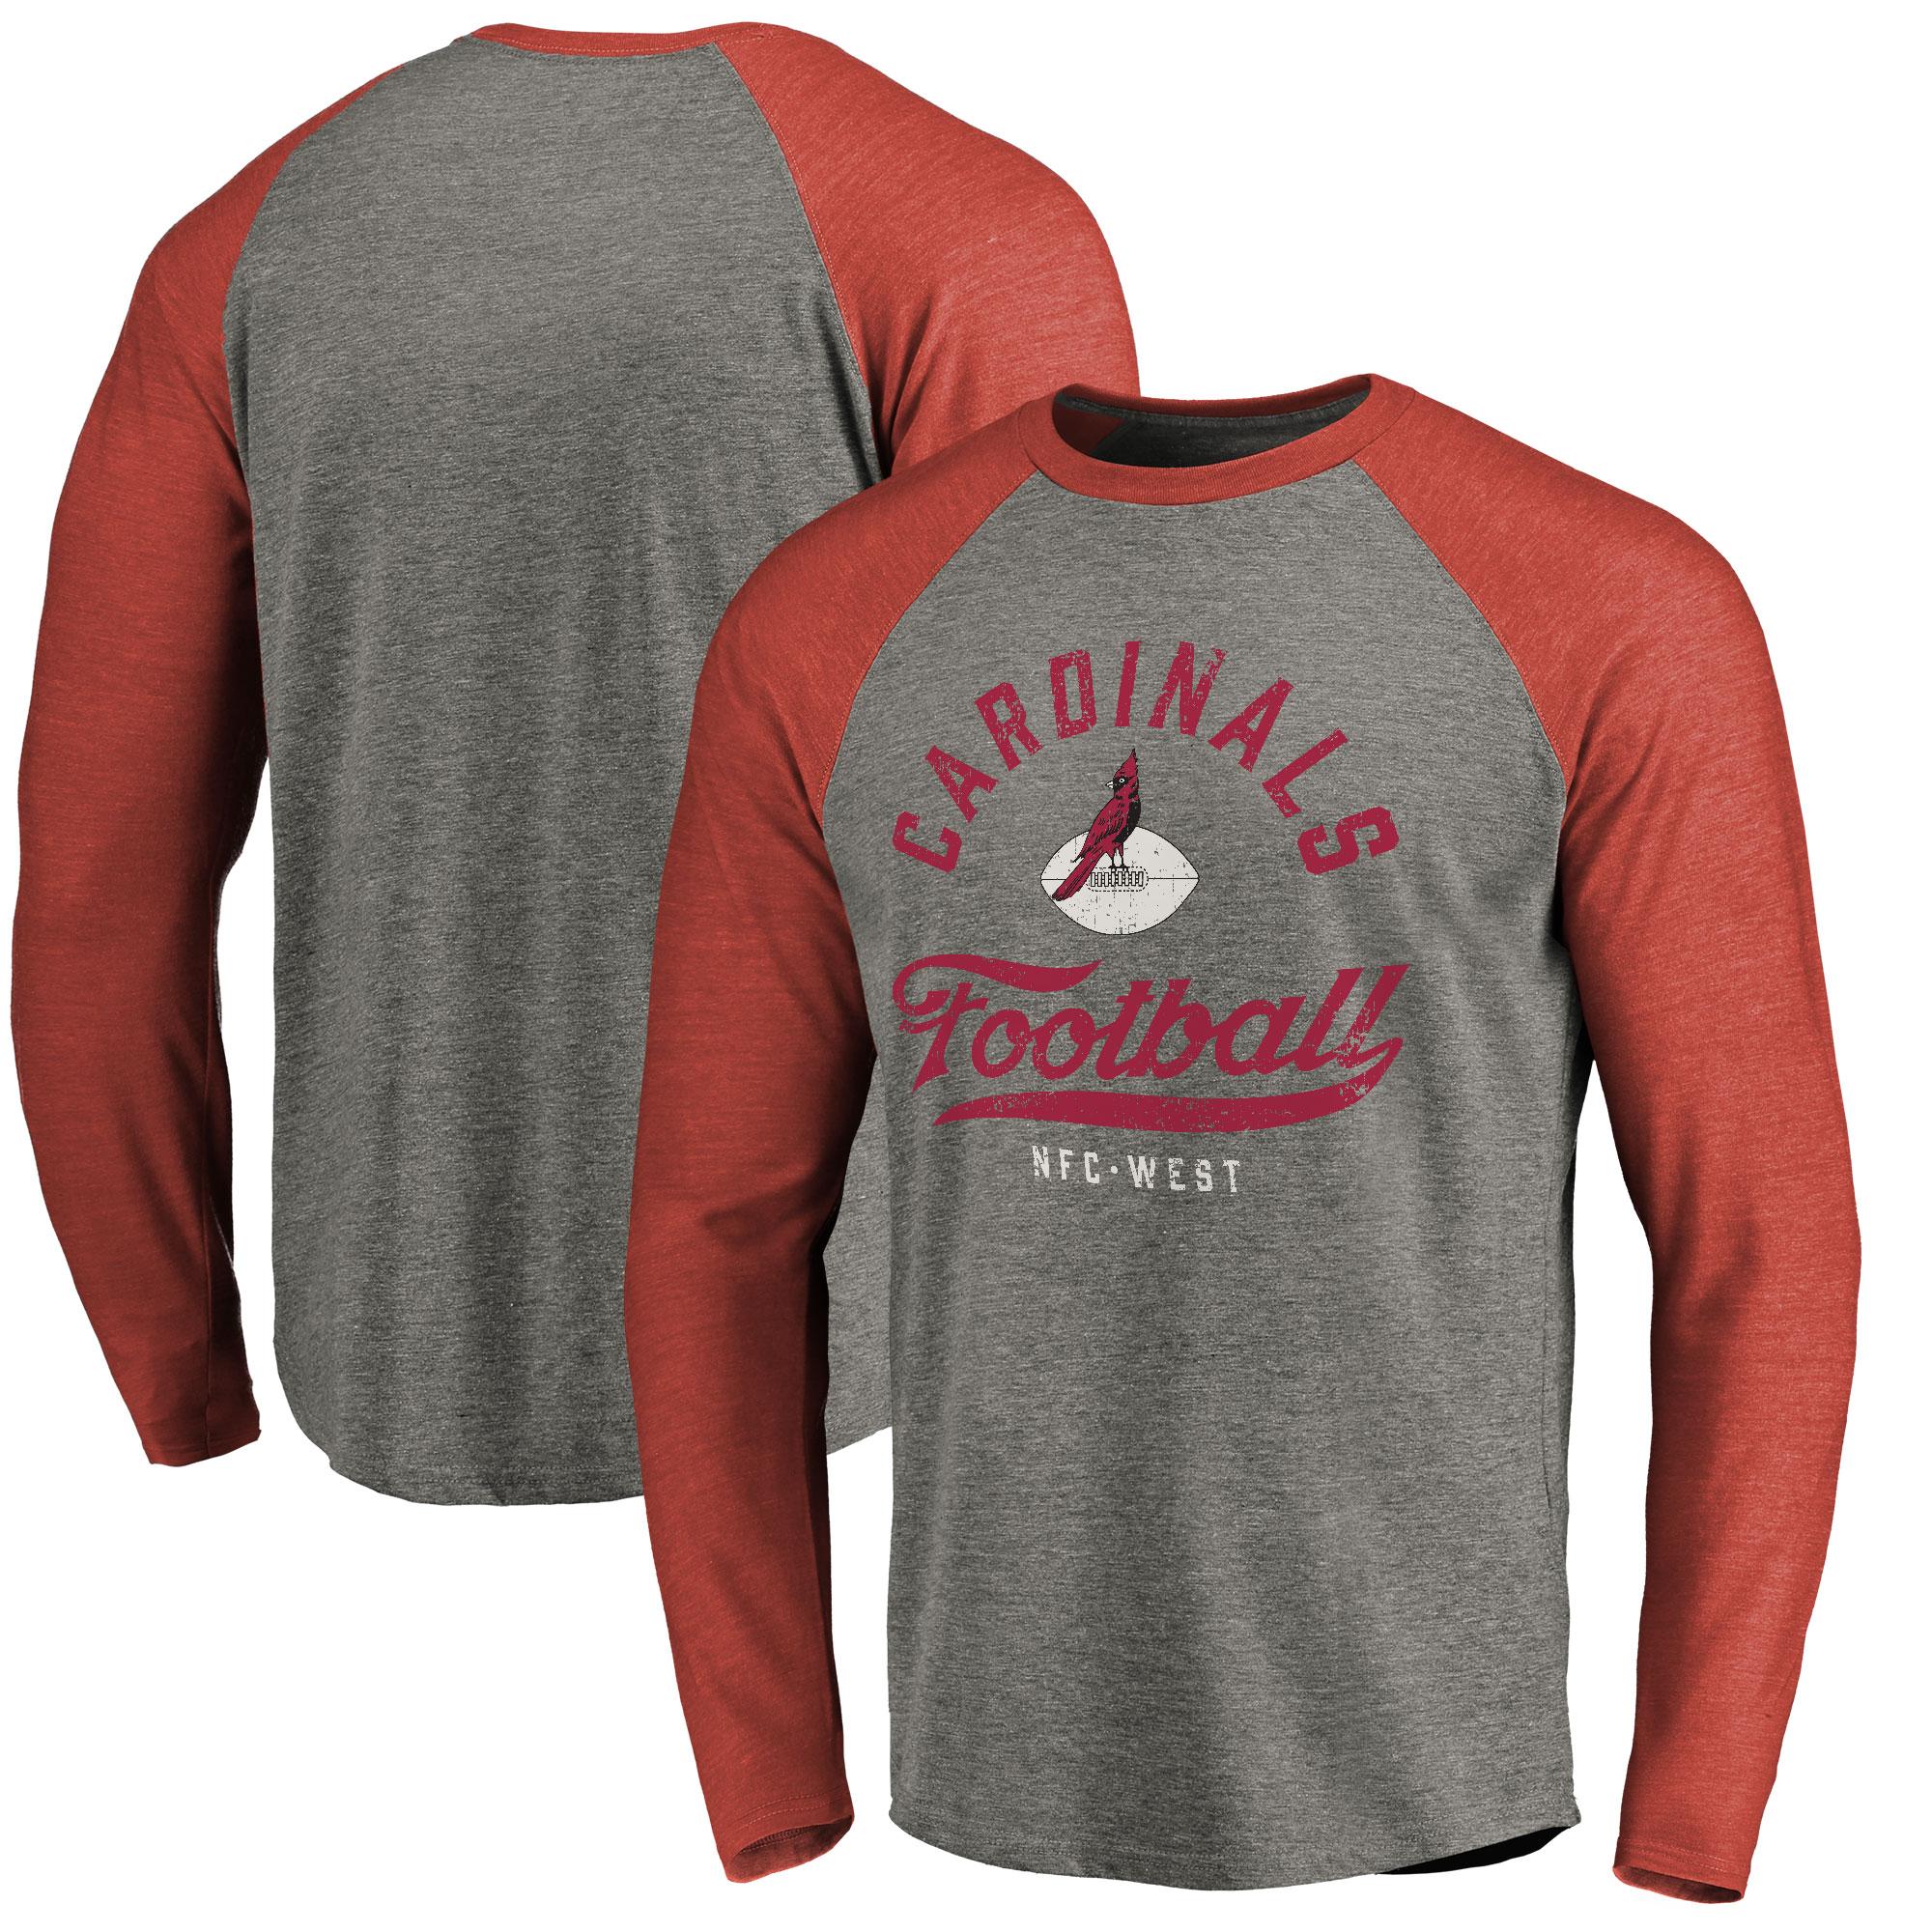 Arizona Cardinals NFL Pro Line by Fanatics Branded Emblem Raglan Tri-Blend Long Sleeve T-Shirt - Heathered Gray/Cardinal